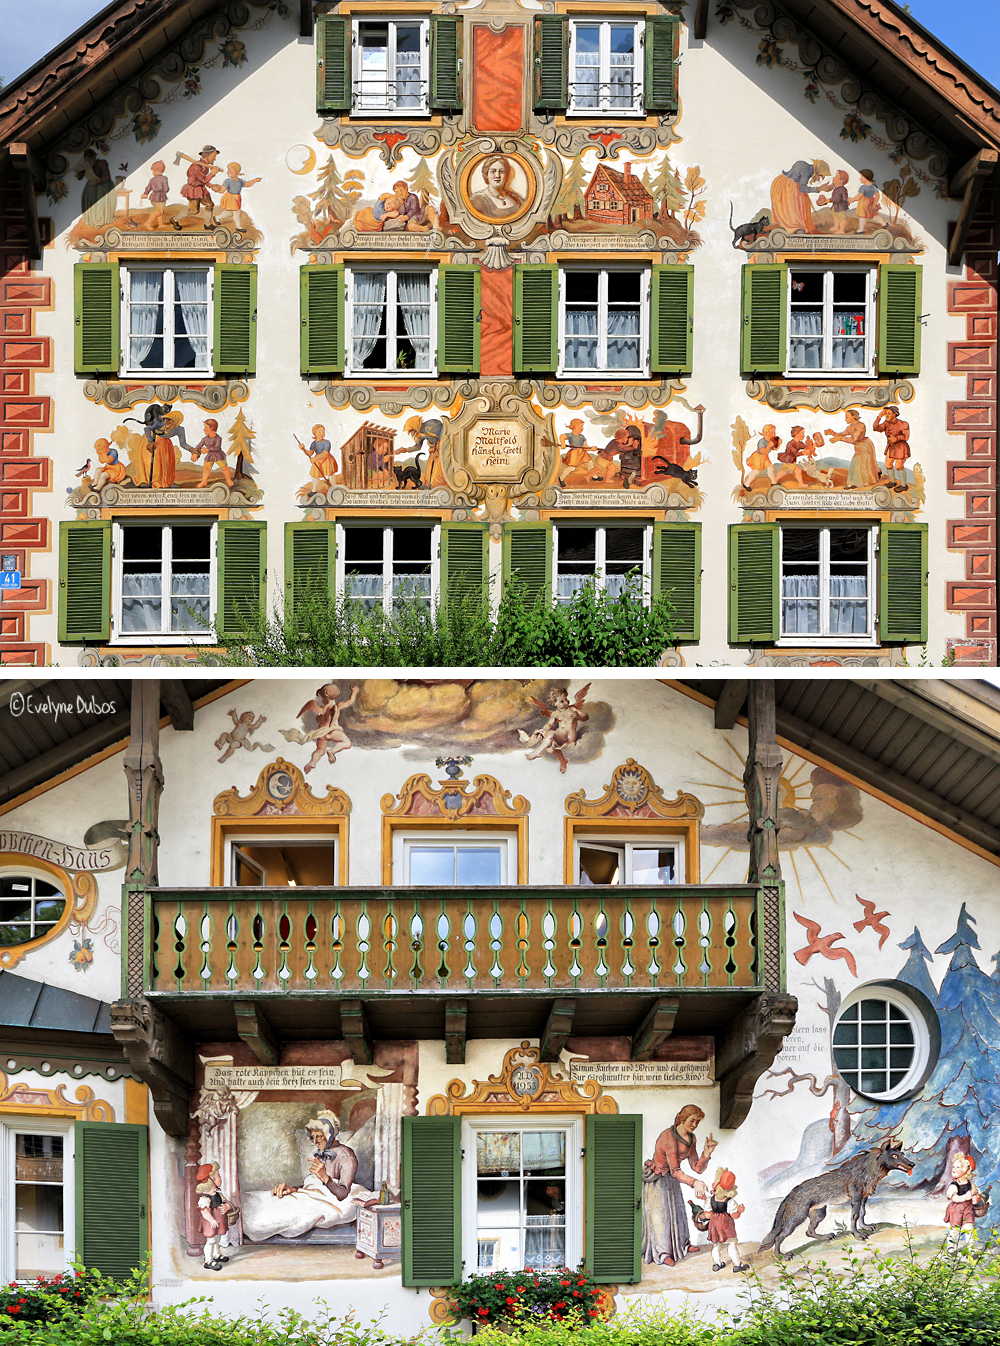 Façades bavaroises (2) : les contes.